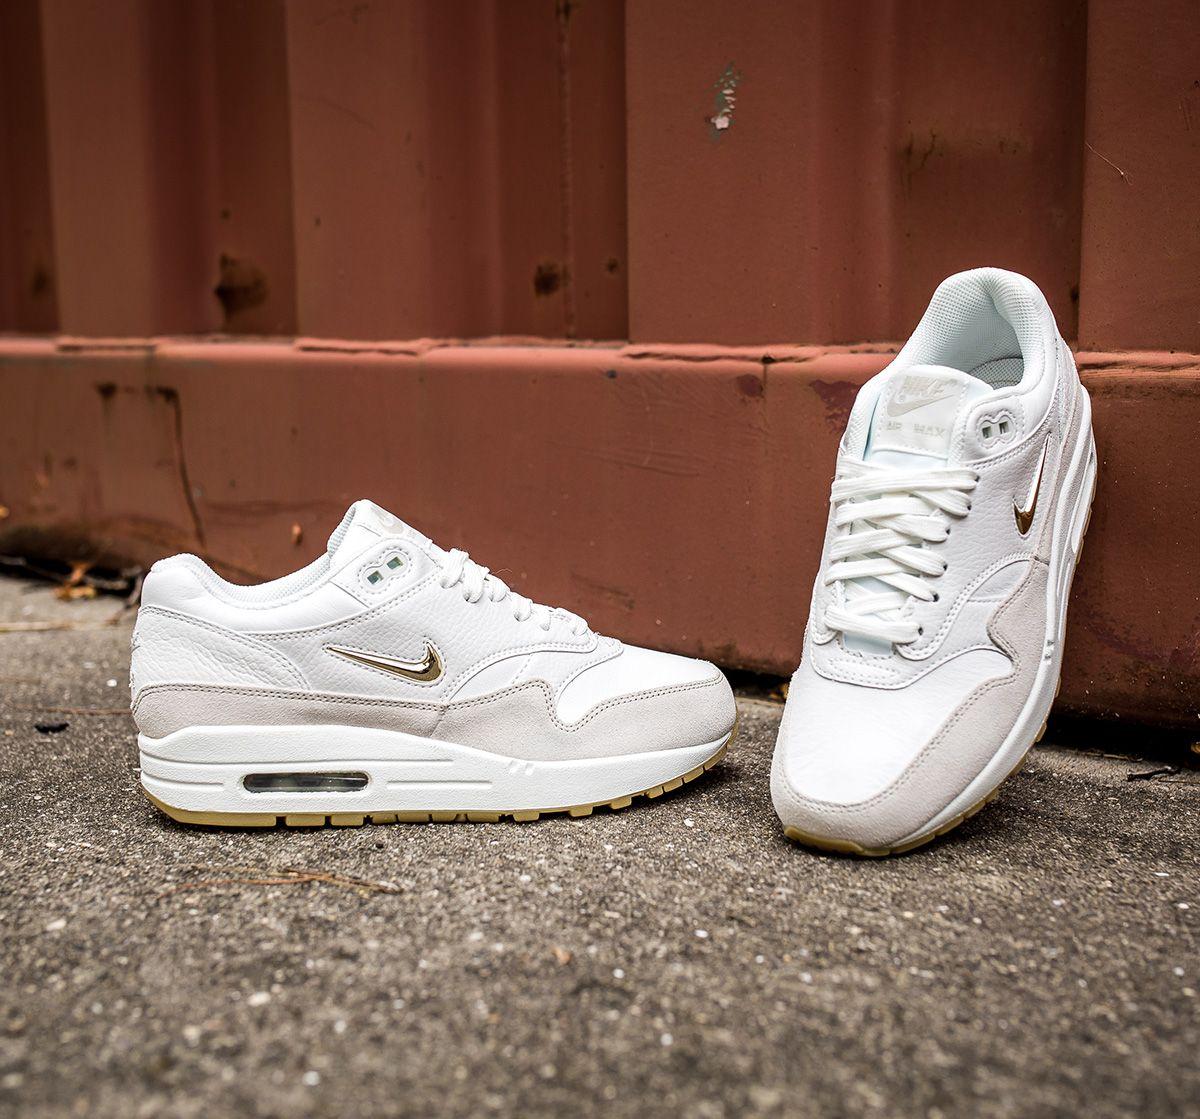 76f2e159904f Nike Air Max 1 Premium SC